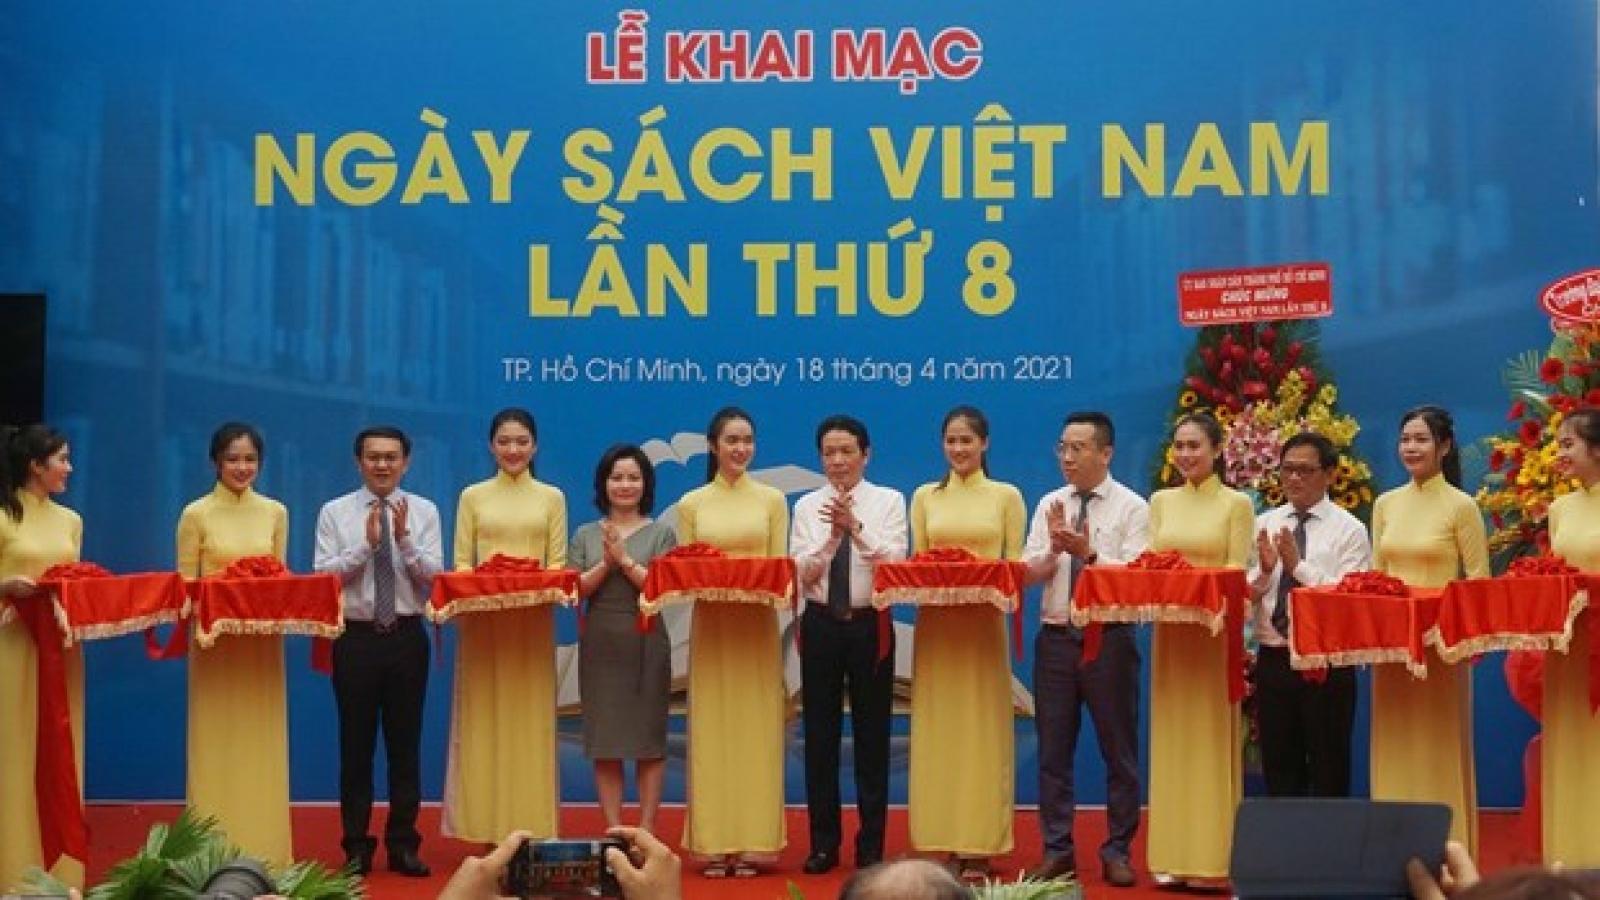 8th Vietnam Book Day kicks off in HCM City